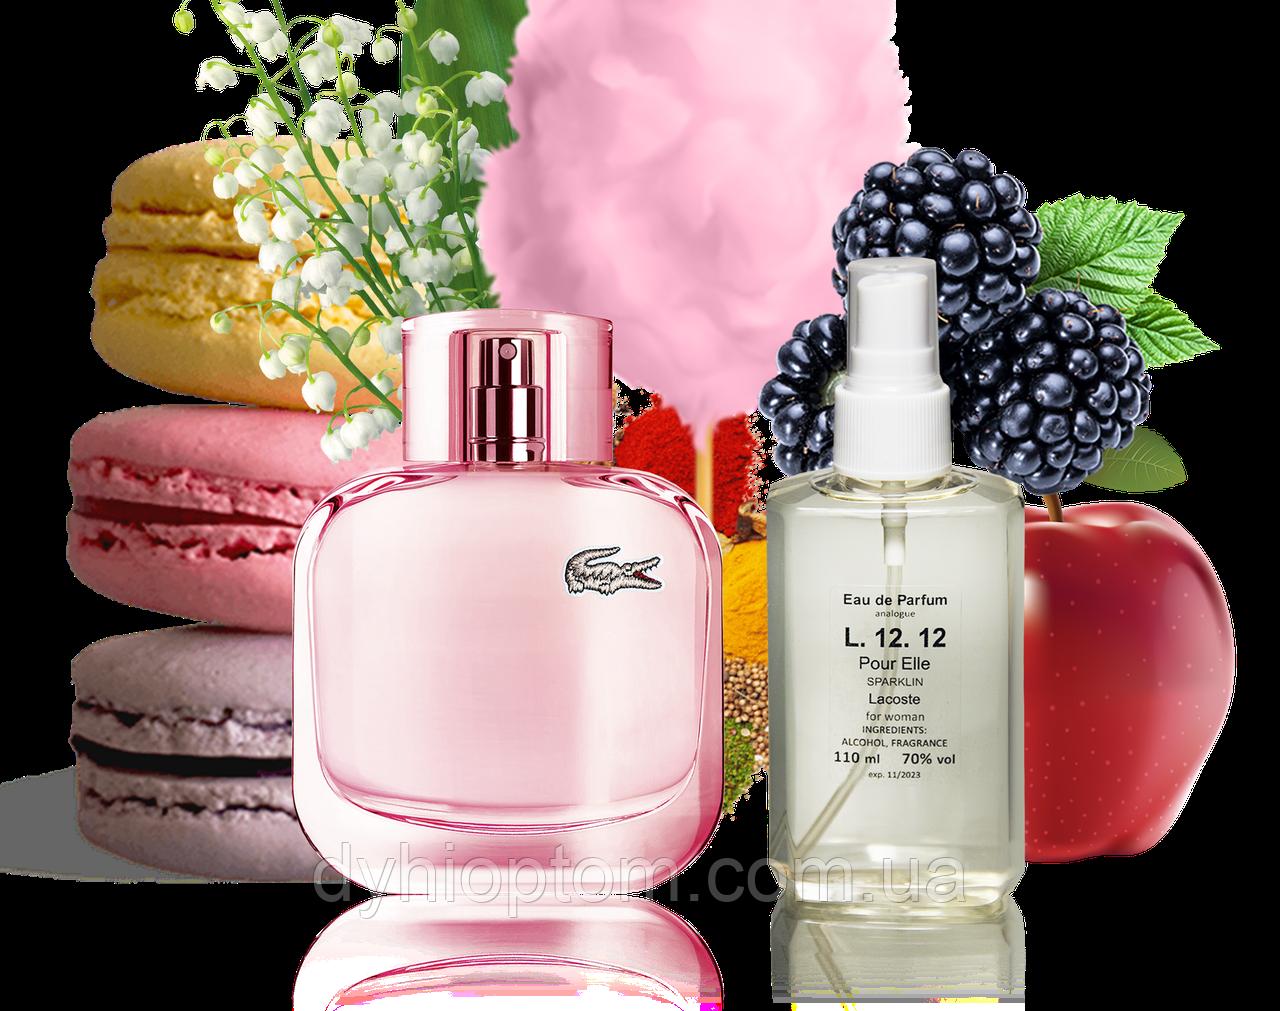 Аналог жіночого парфуму Eau De L. 12.12 Pour Elle Sparkling 110ml в пластиці